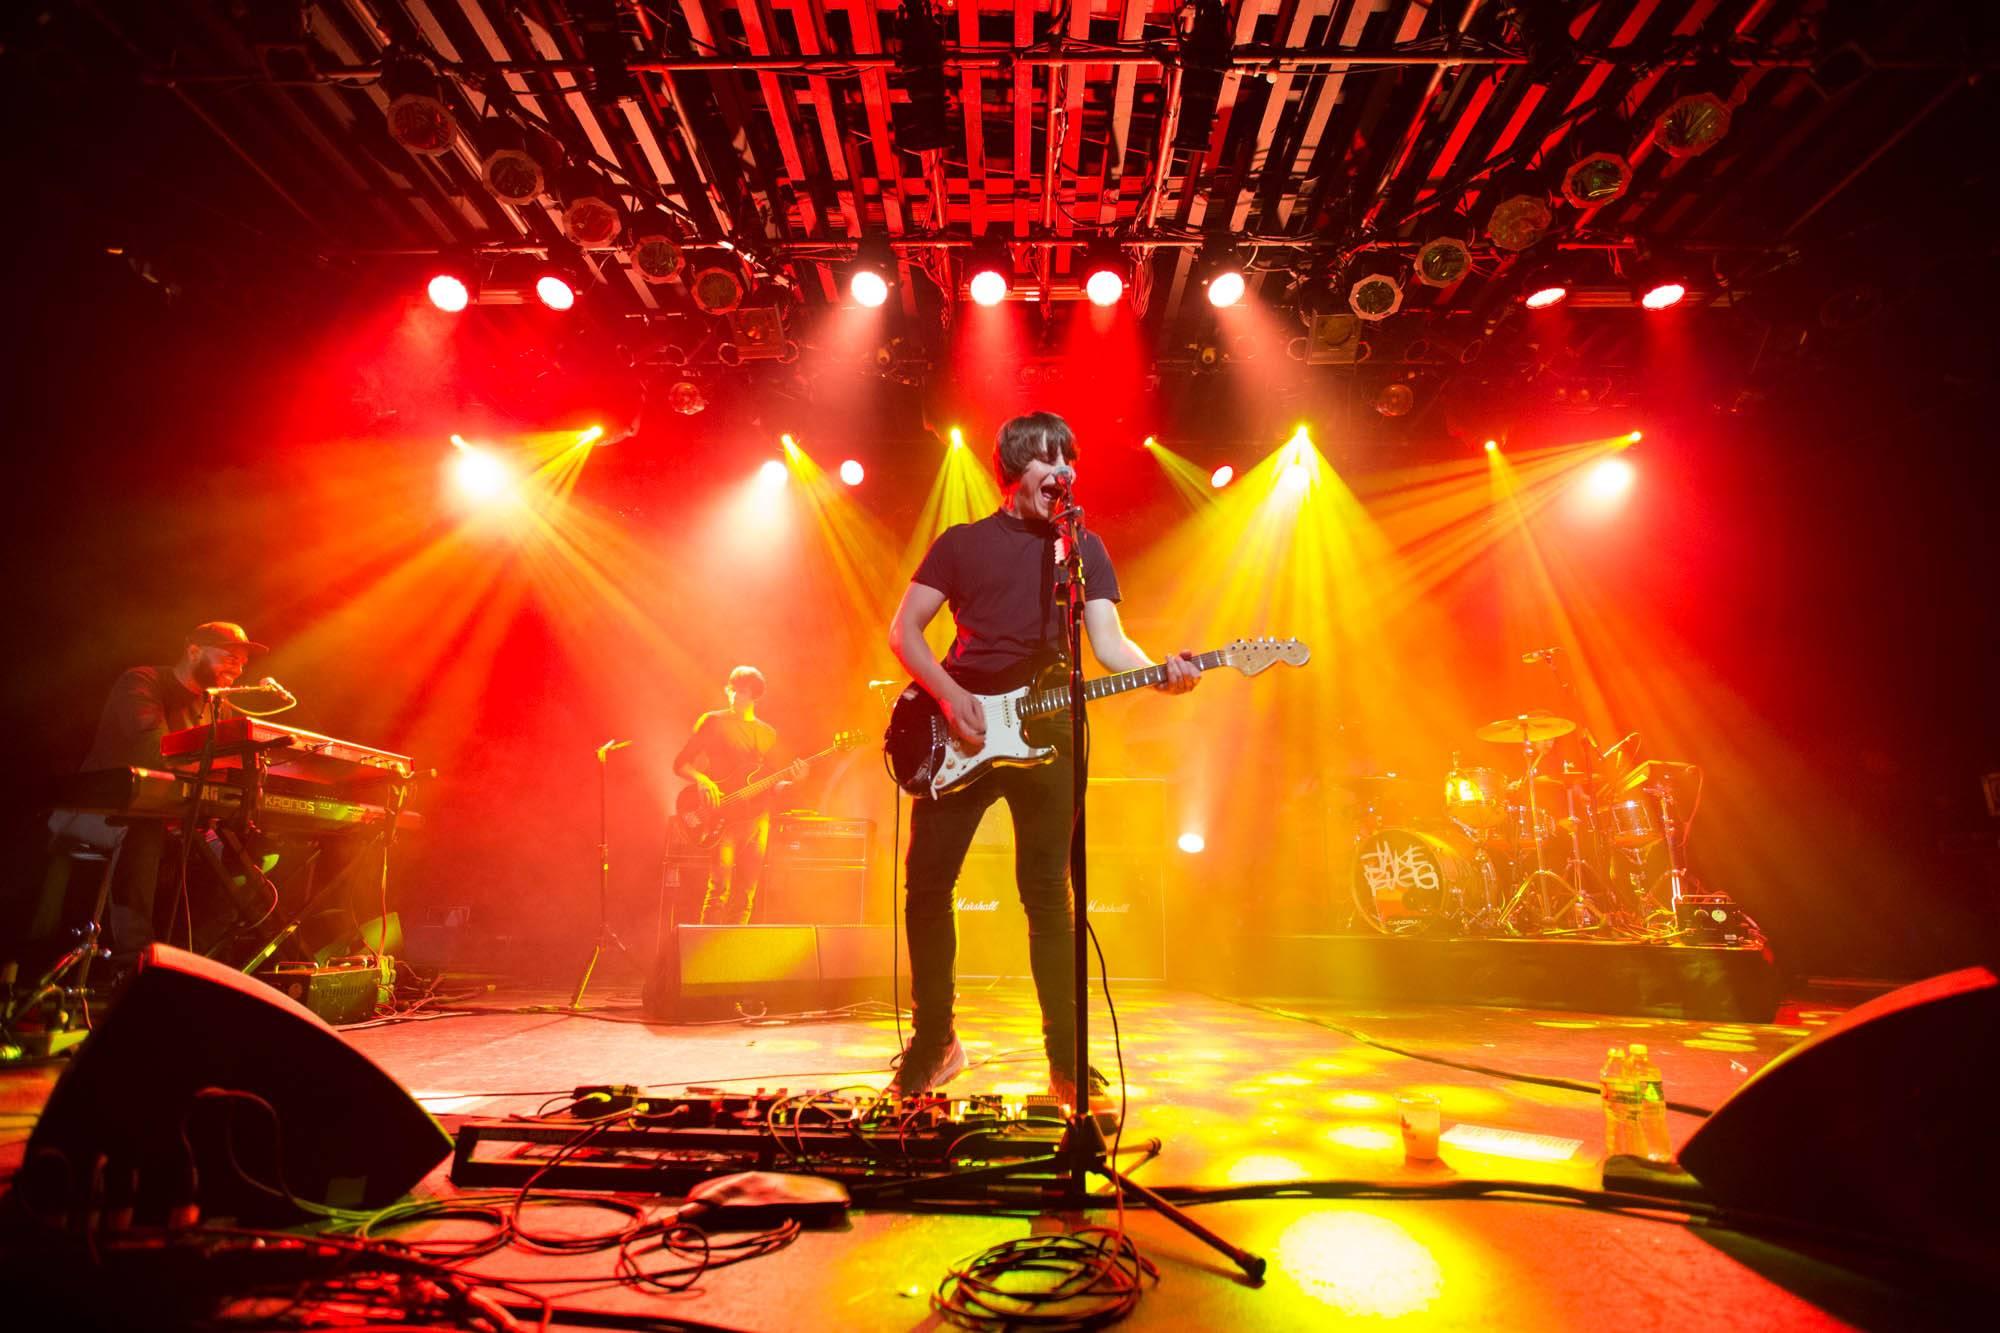 Jake Bugg at the Commodore Ballroom, Vancouver, Sept. 7 2016. Kirk Chantraine photo.